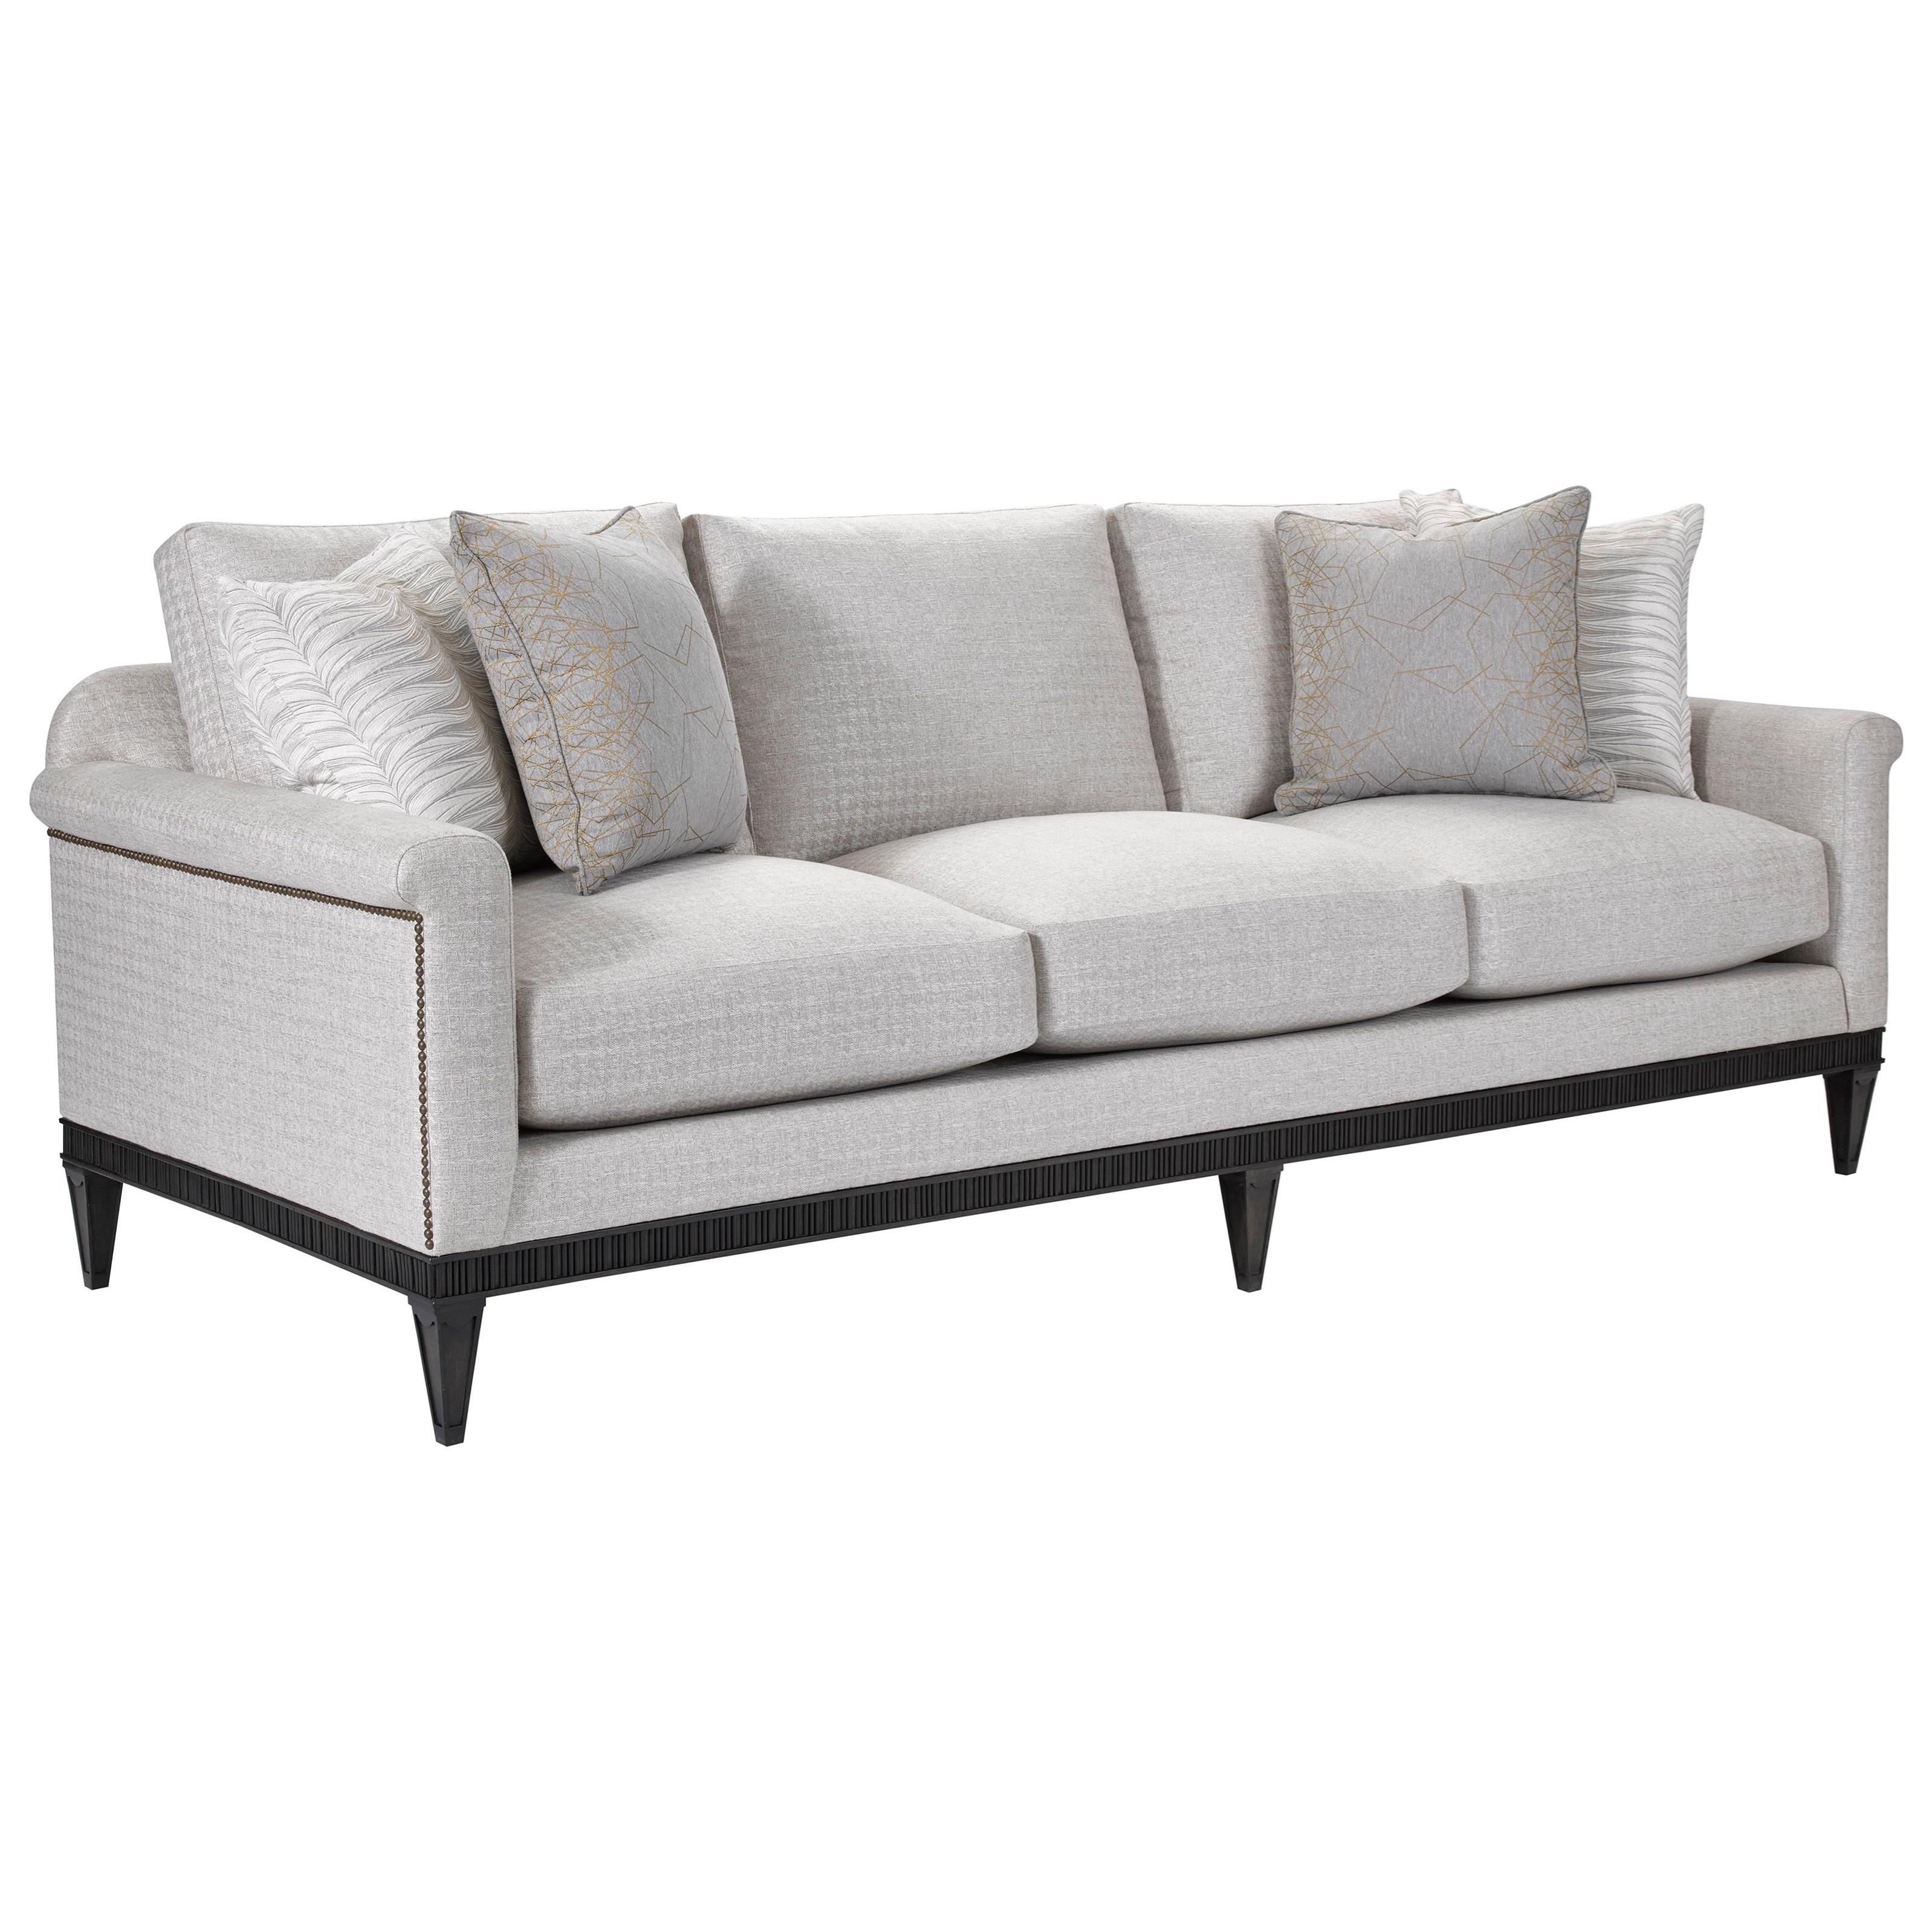 Broyhill Furniture Cashmera Sofa - Item Number: 4282-3-4697-92